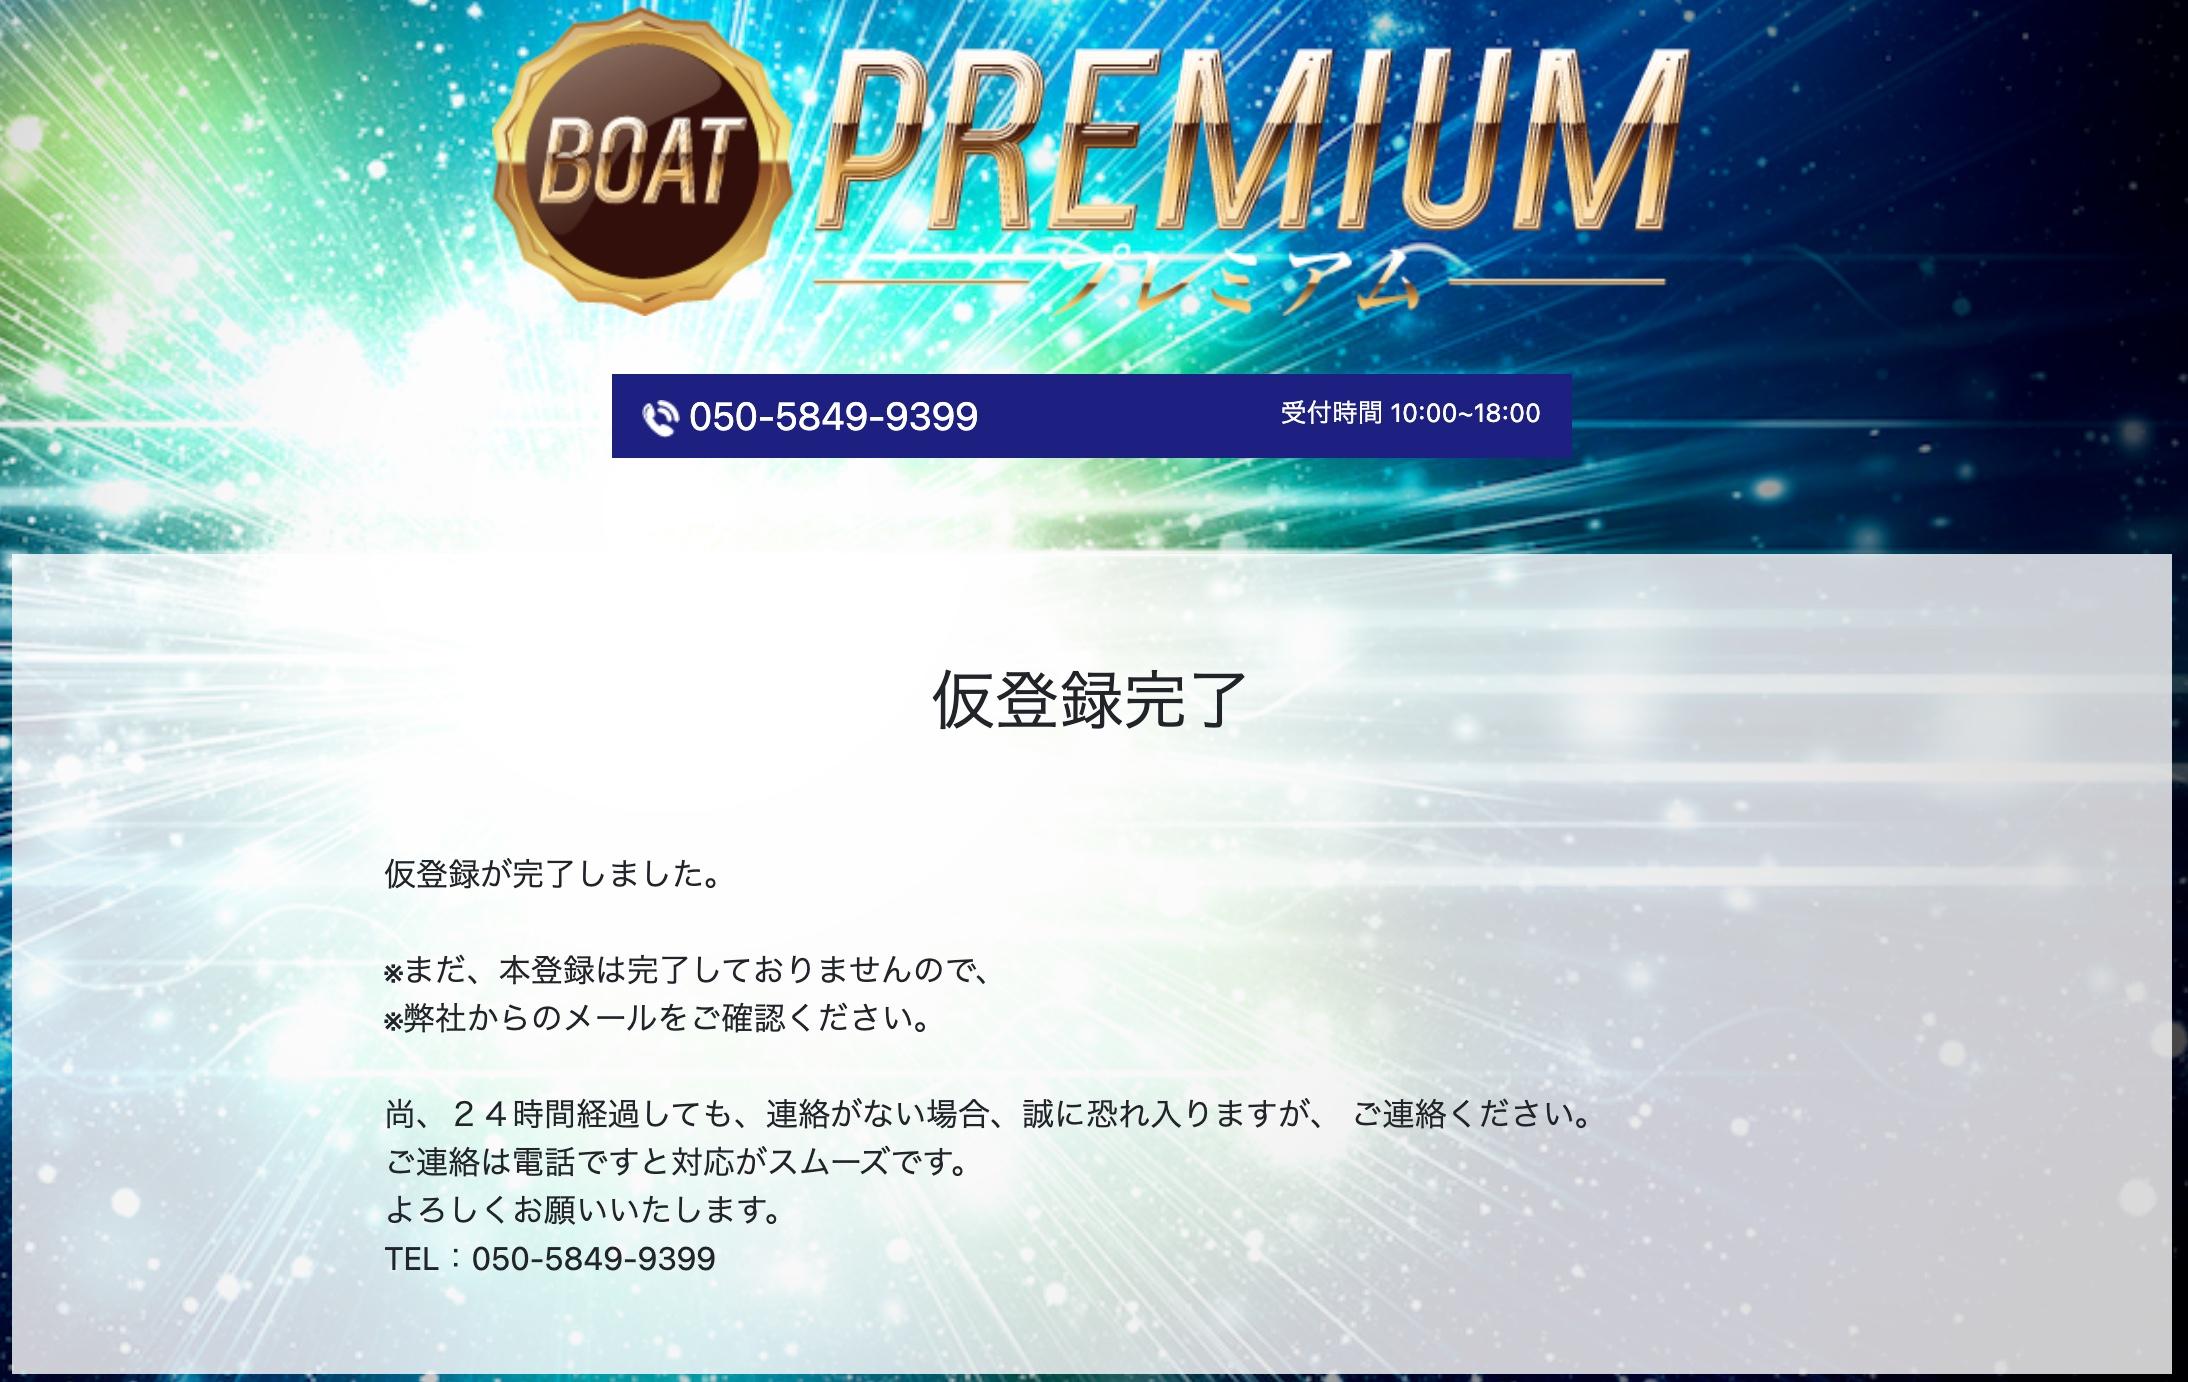 BOATPREMIUM(ボートプレミアム)20